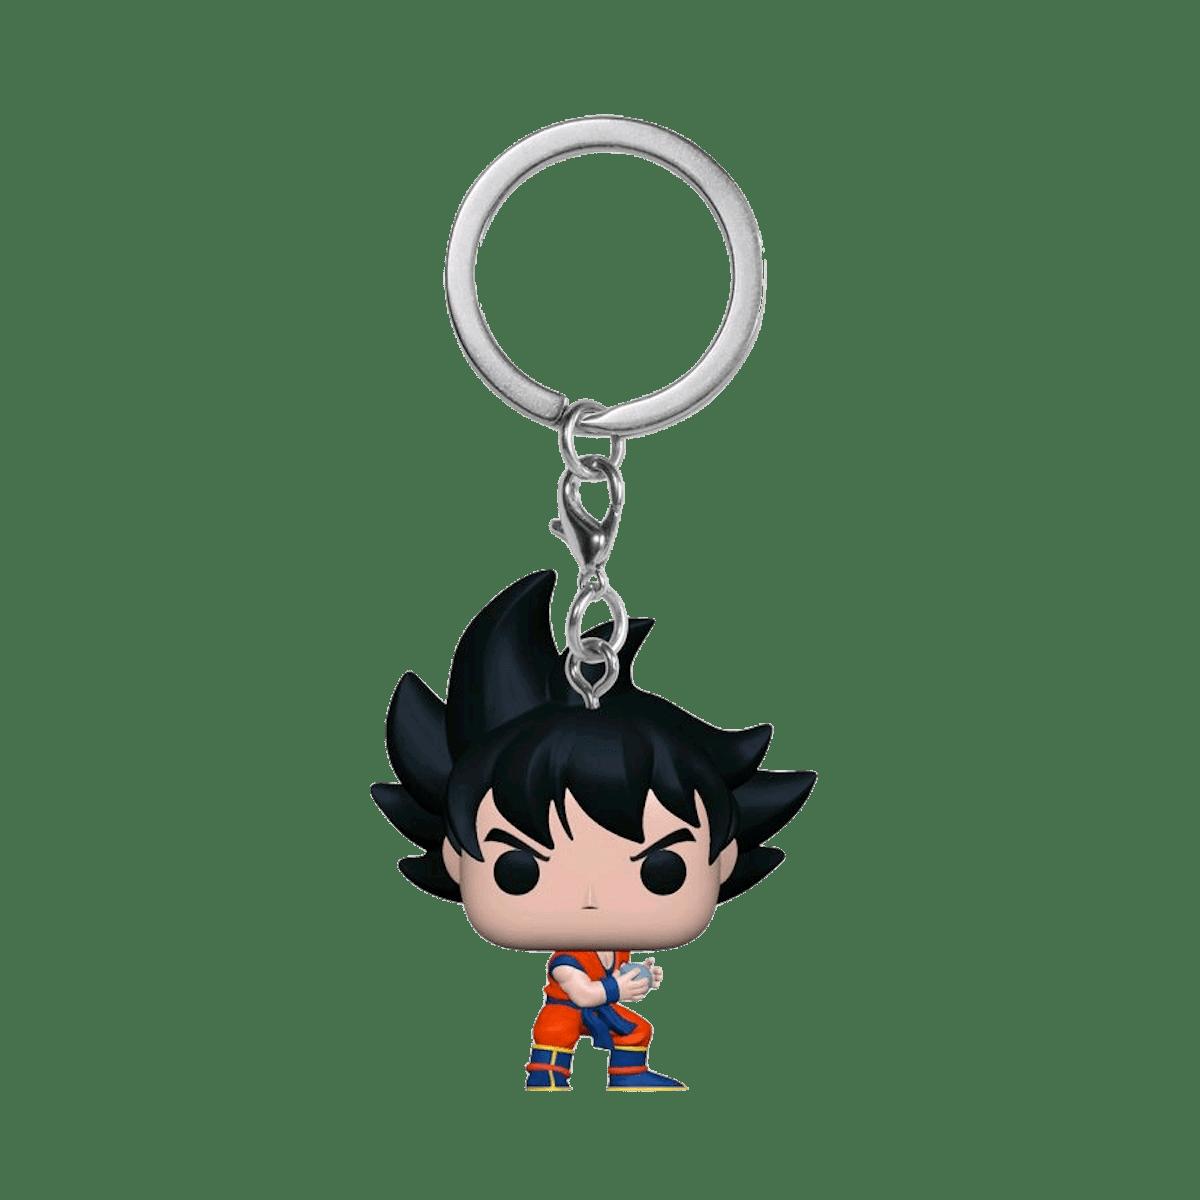 Фанко ПОП Гоку Камехамеха металлик брелок (Goku with Kamehameha Keychain Metallic (Эксклюзив Box Lunch и Hot Topic)) из аниме Драконий жемчуг Зет